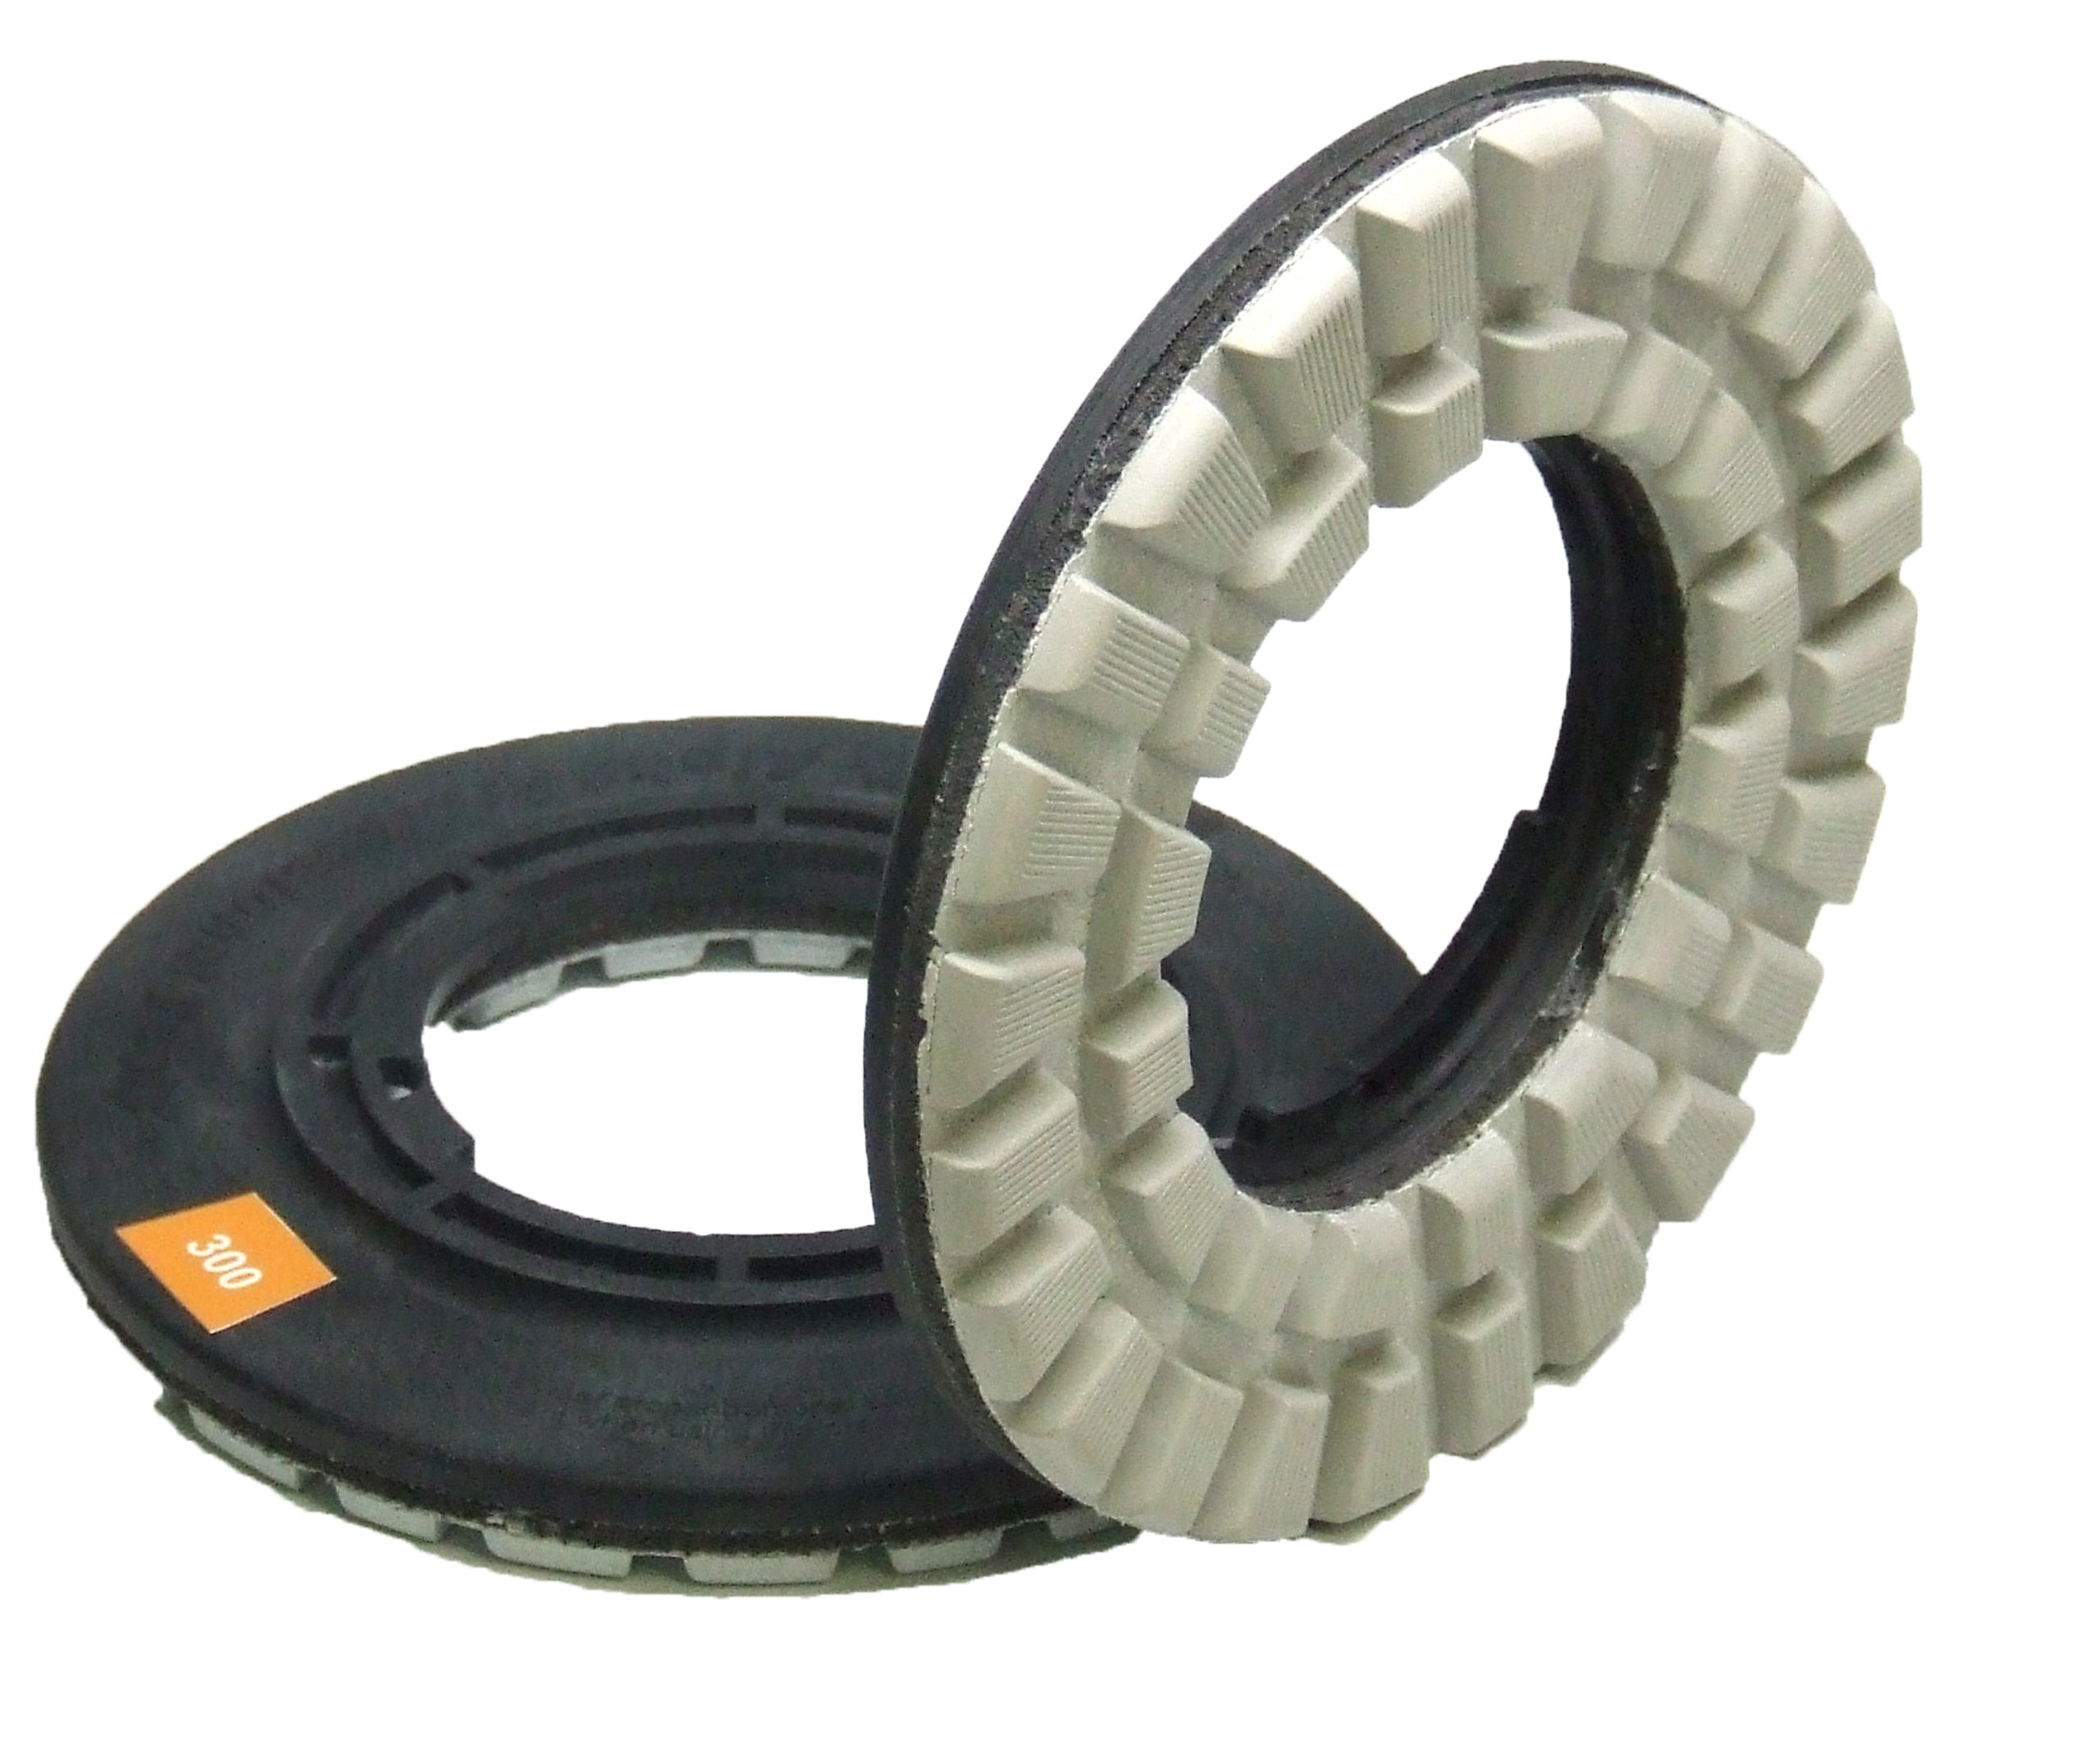 Alpha 5''Universal Concrete Wet/Dry Polishing System